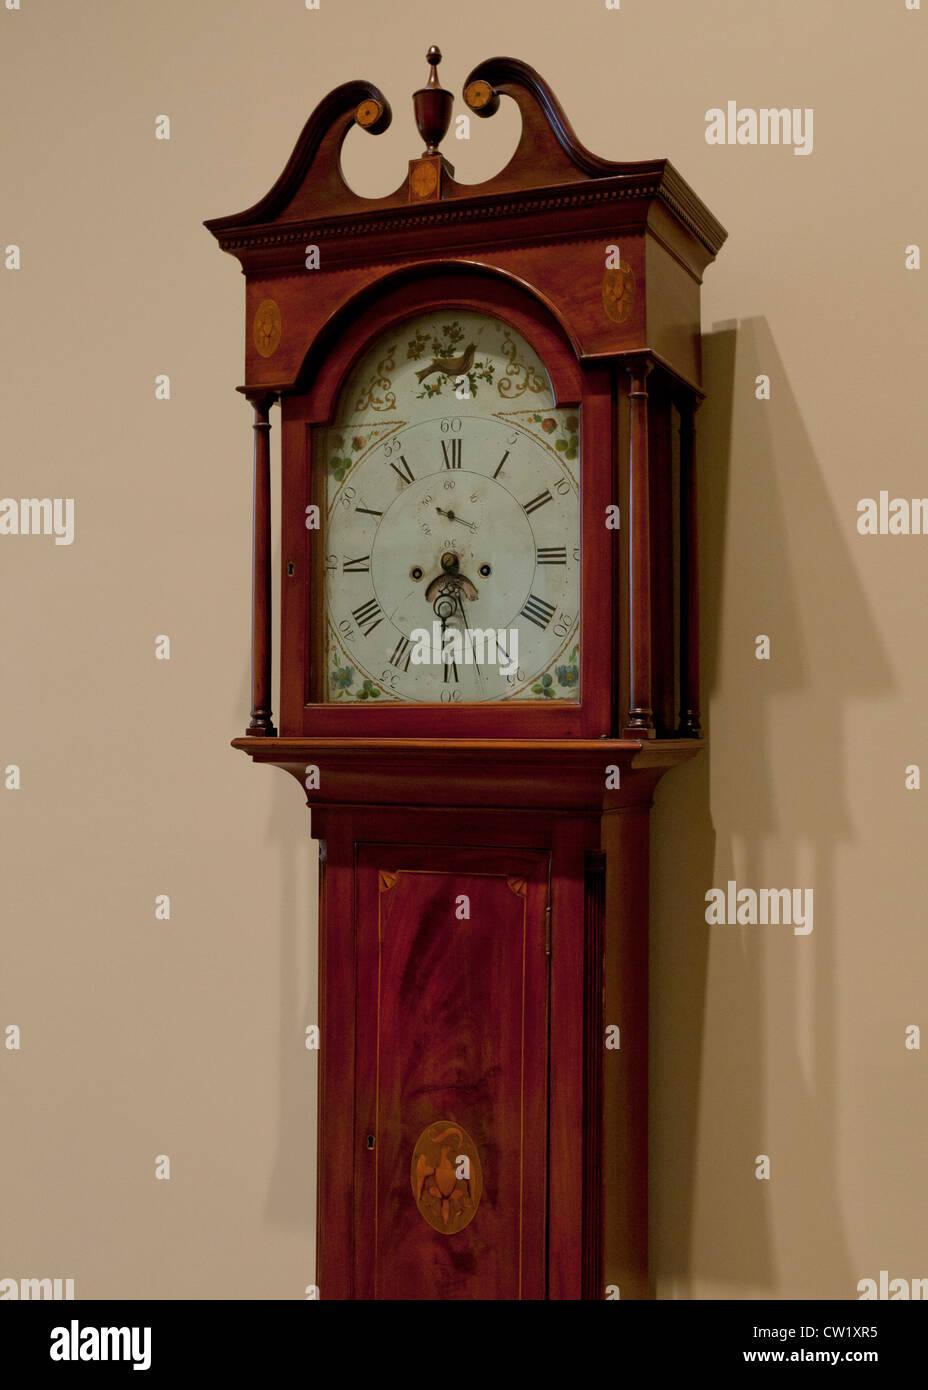 Antique mahogany long-case clock, circa 18th century - USA - Stock Image